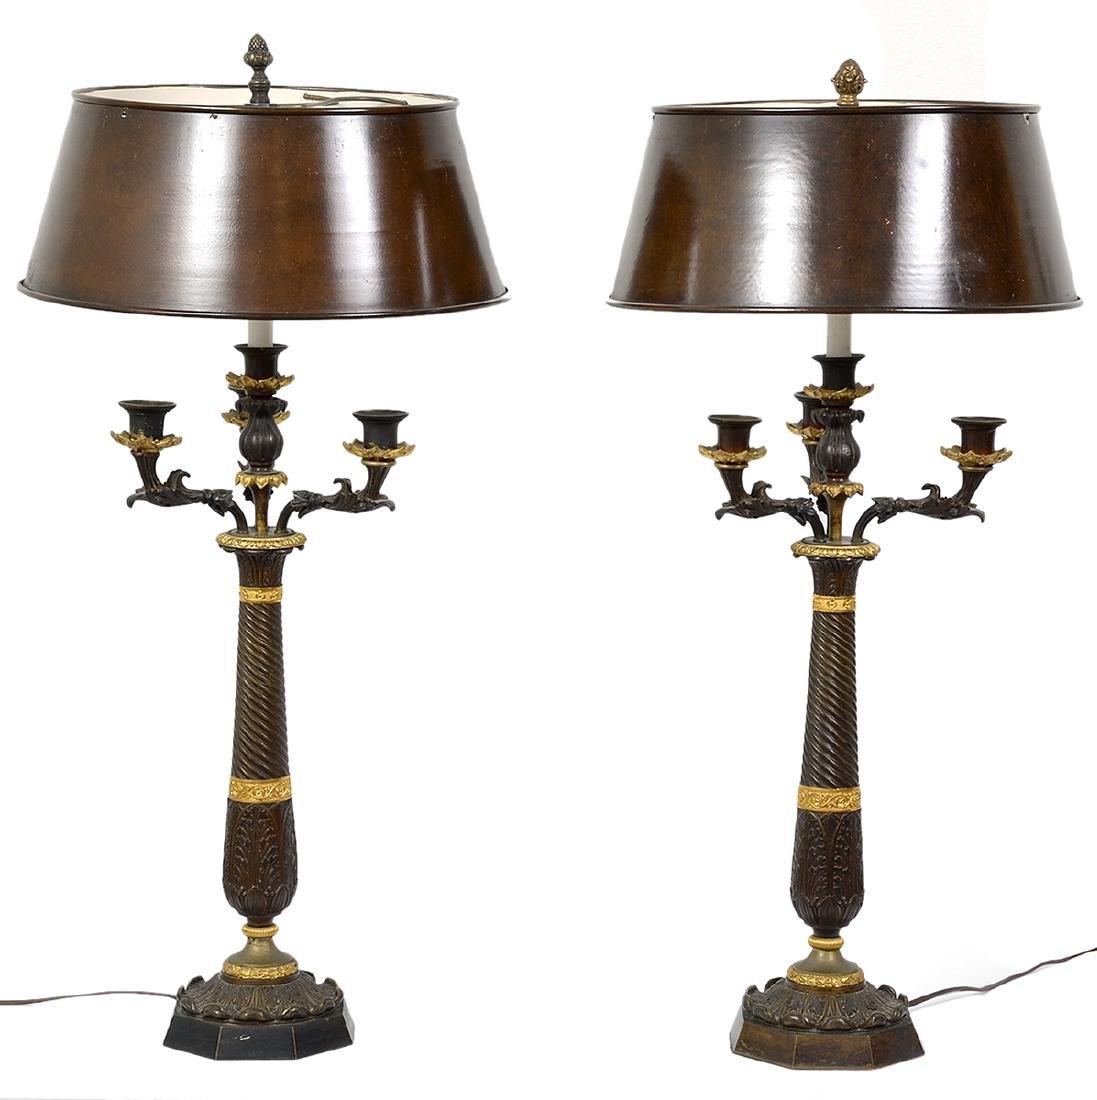 Pr. 19th C. Empire Bronze Candelabra Lamps